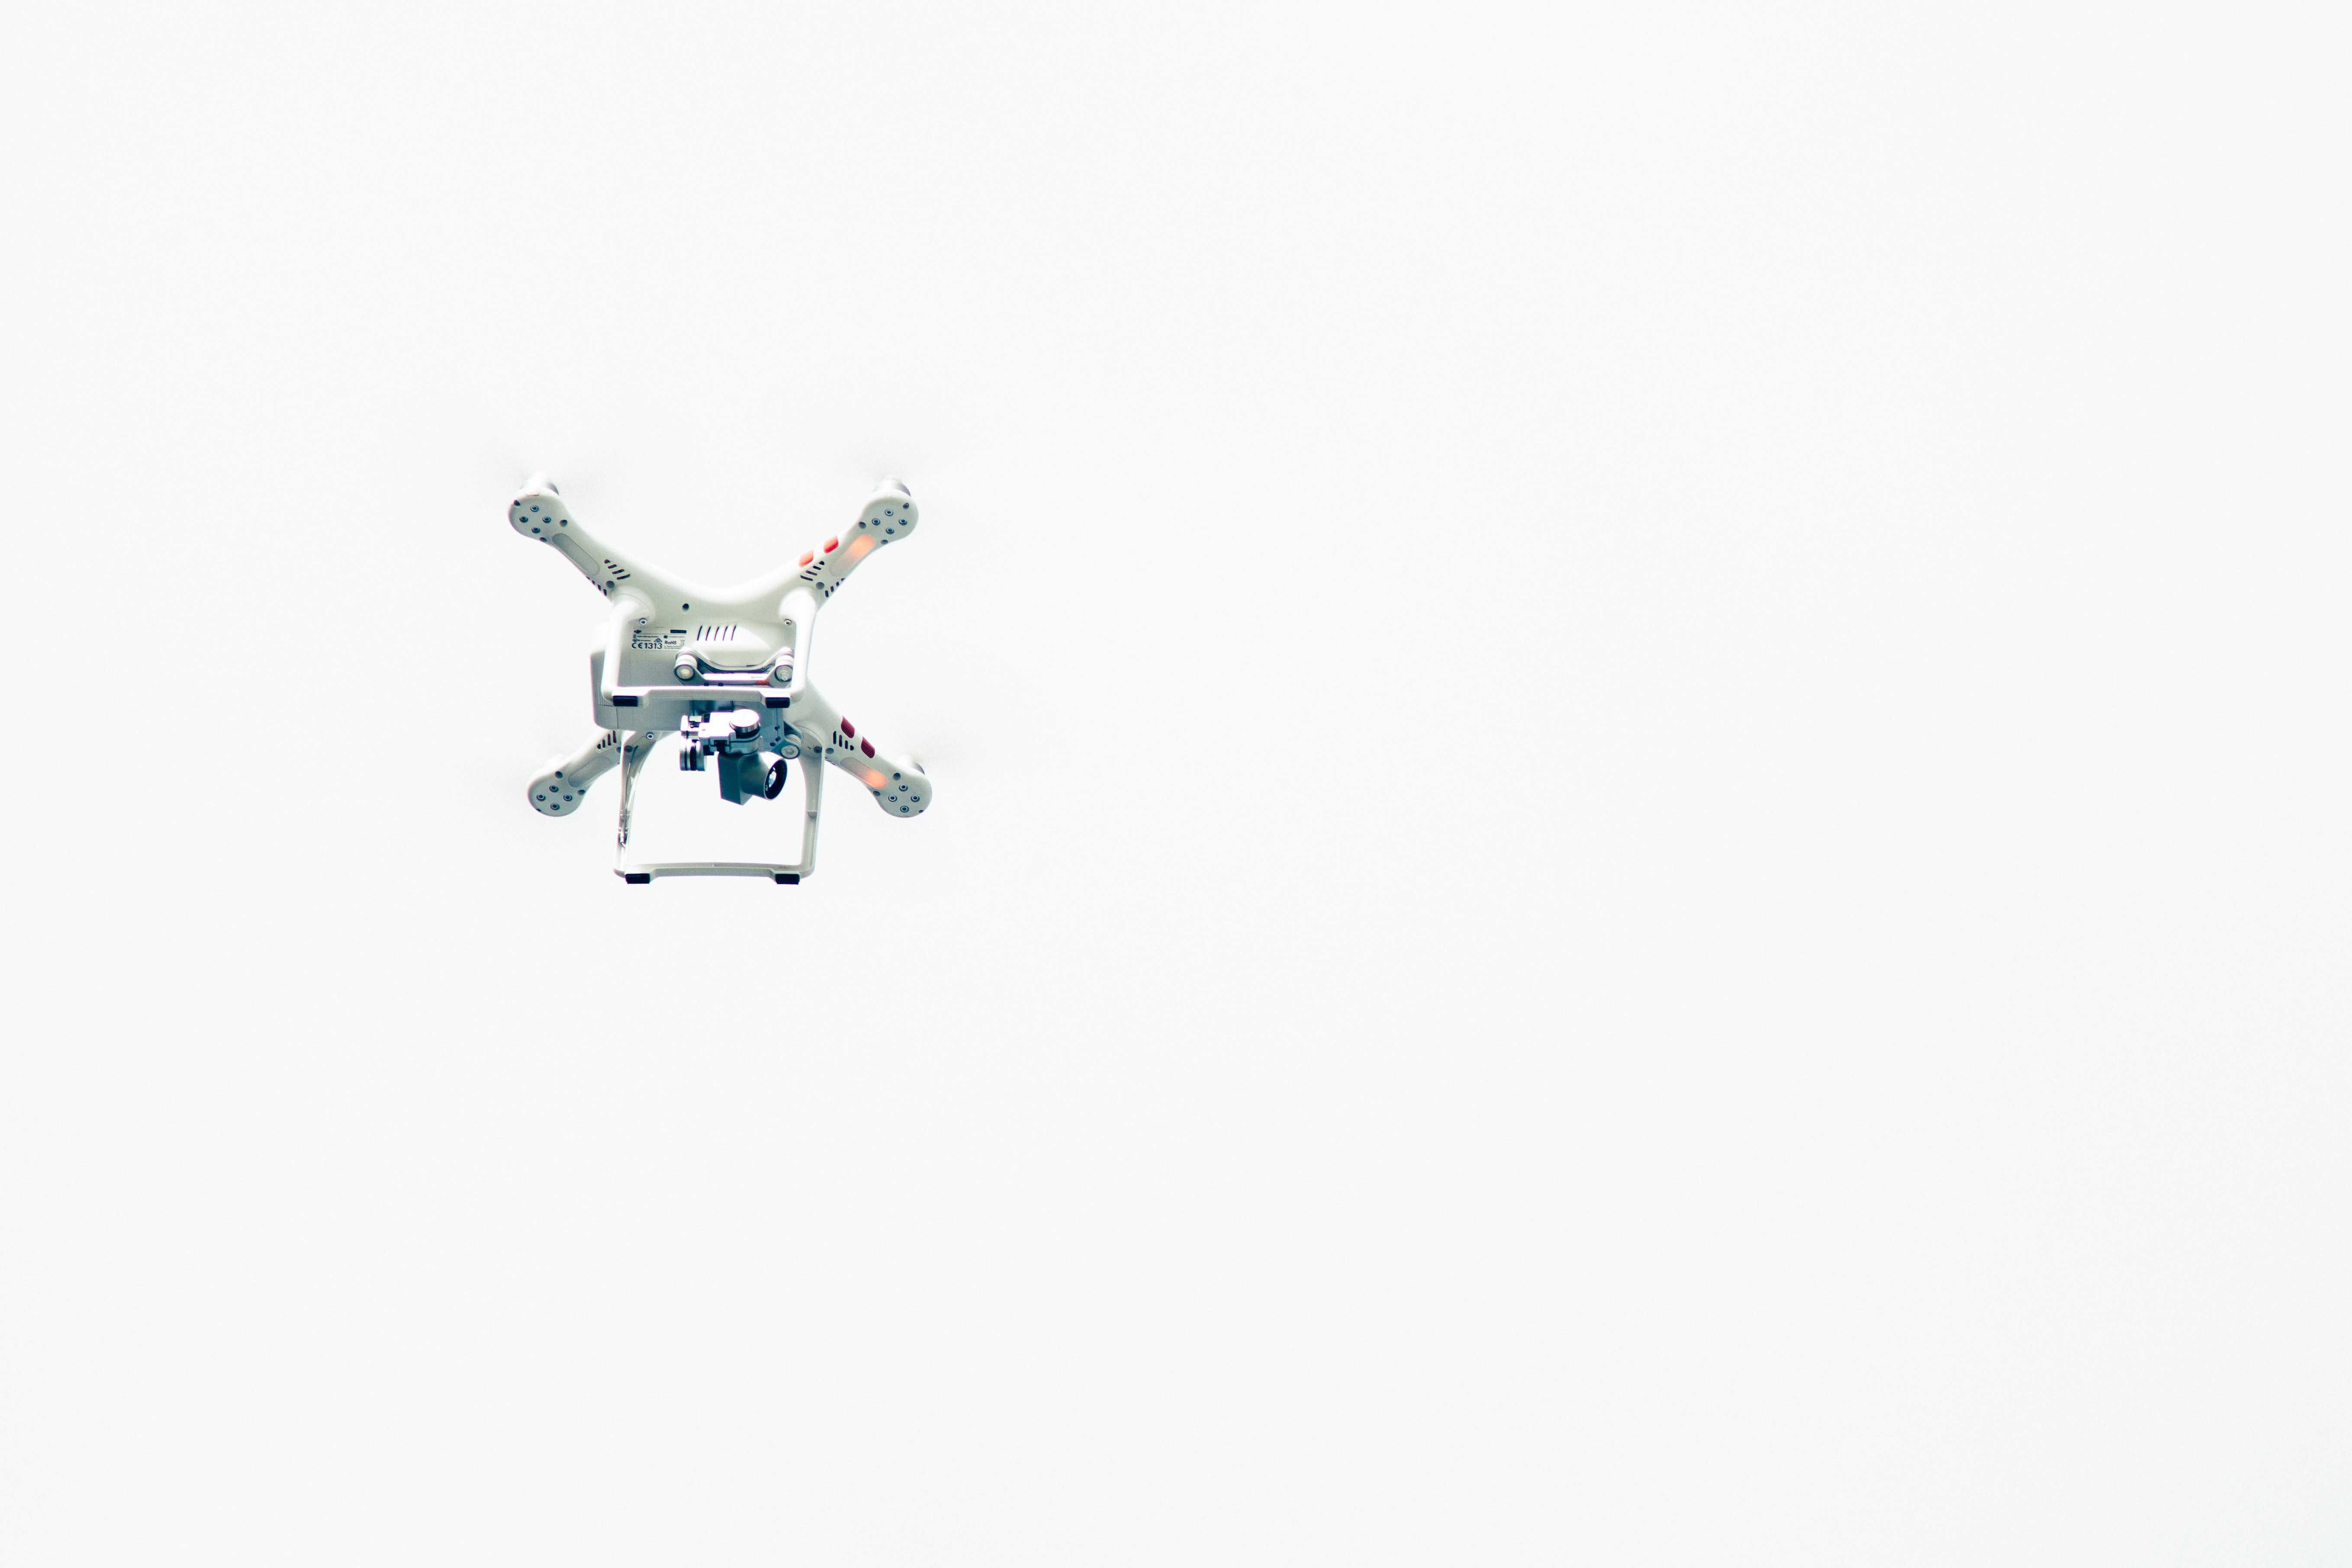 Upload UAV insurance policy